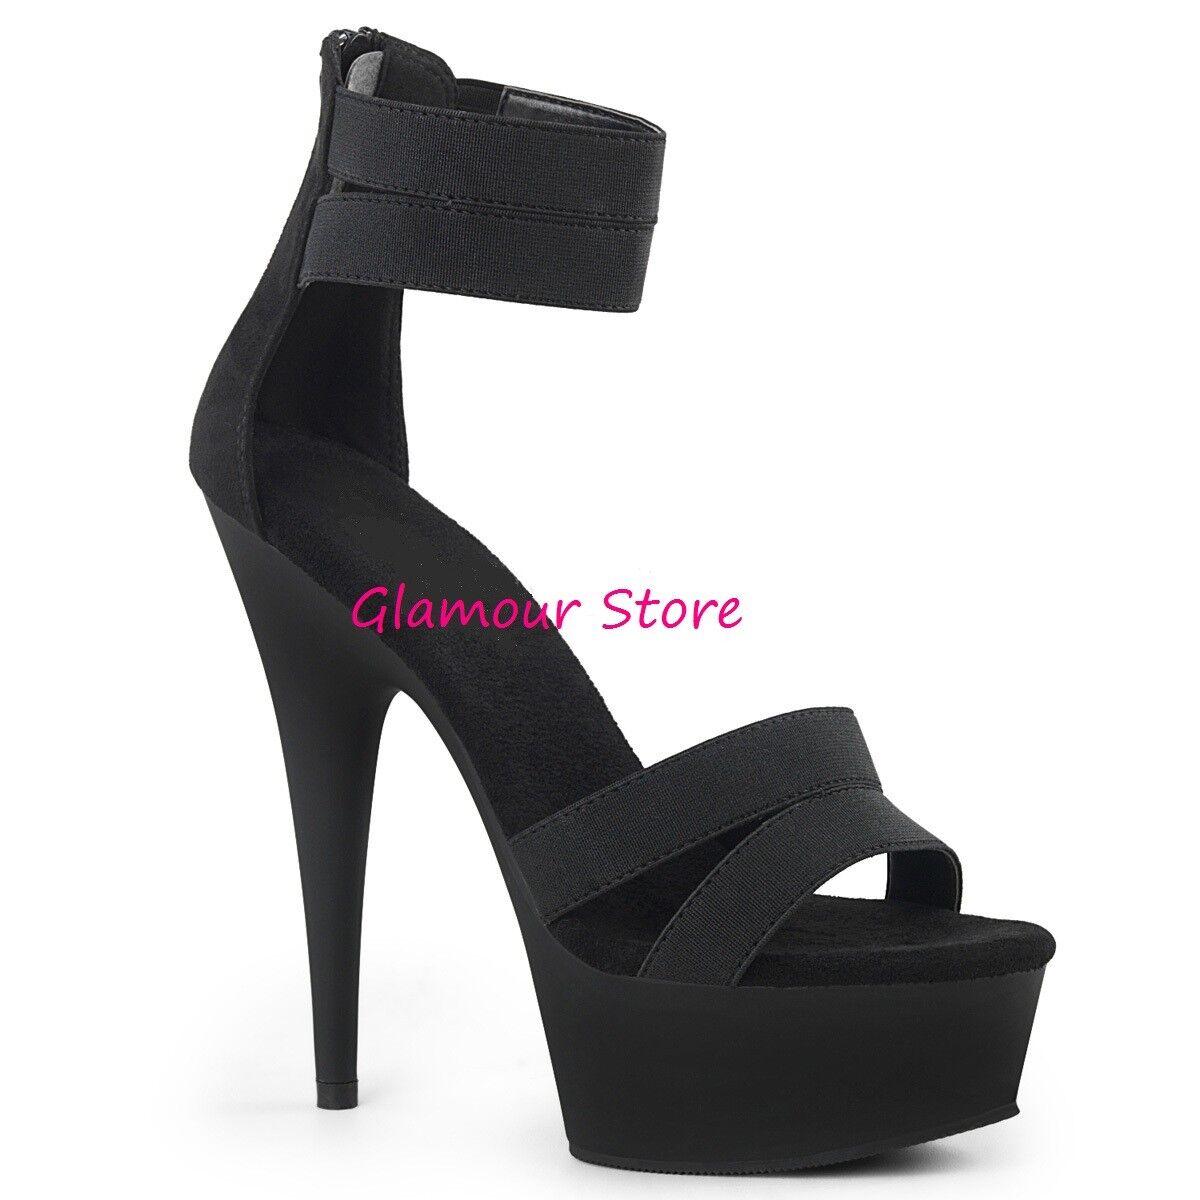 Descuento por tiempo limitado Sexy SANDALI cavigliera tacco 15 NERO plateau dal 35 al 44 zip scarpe club